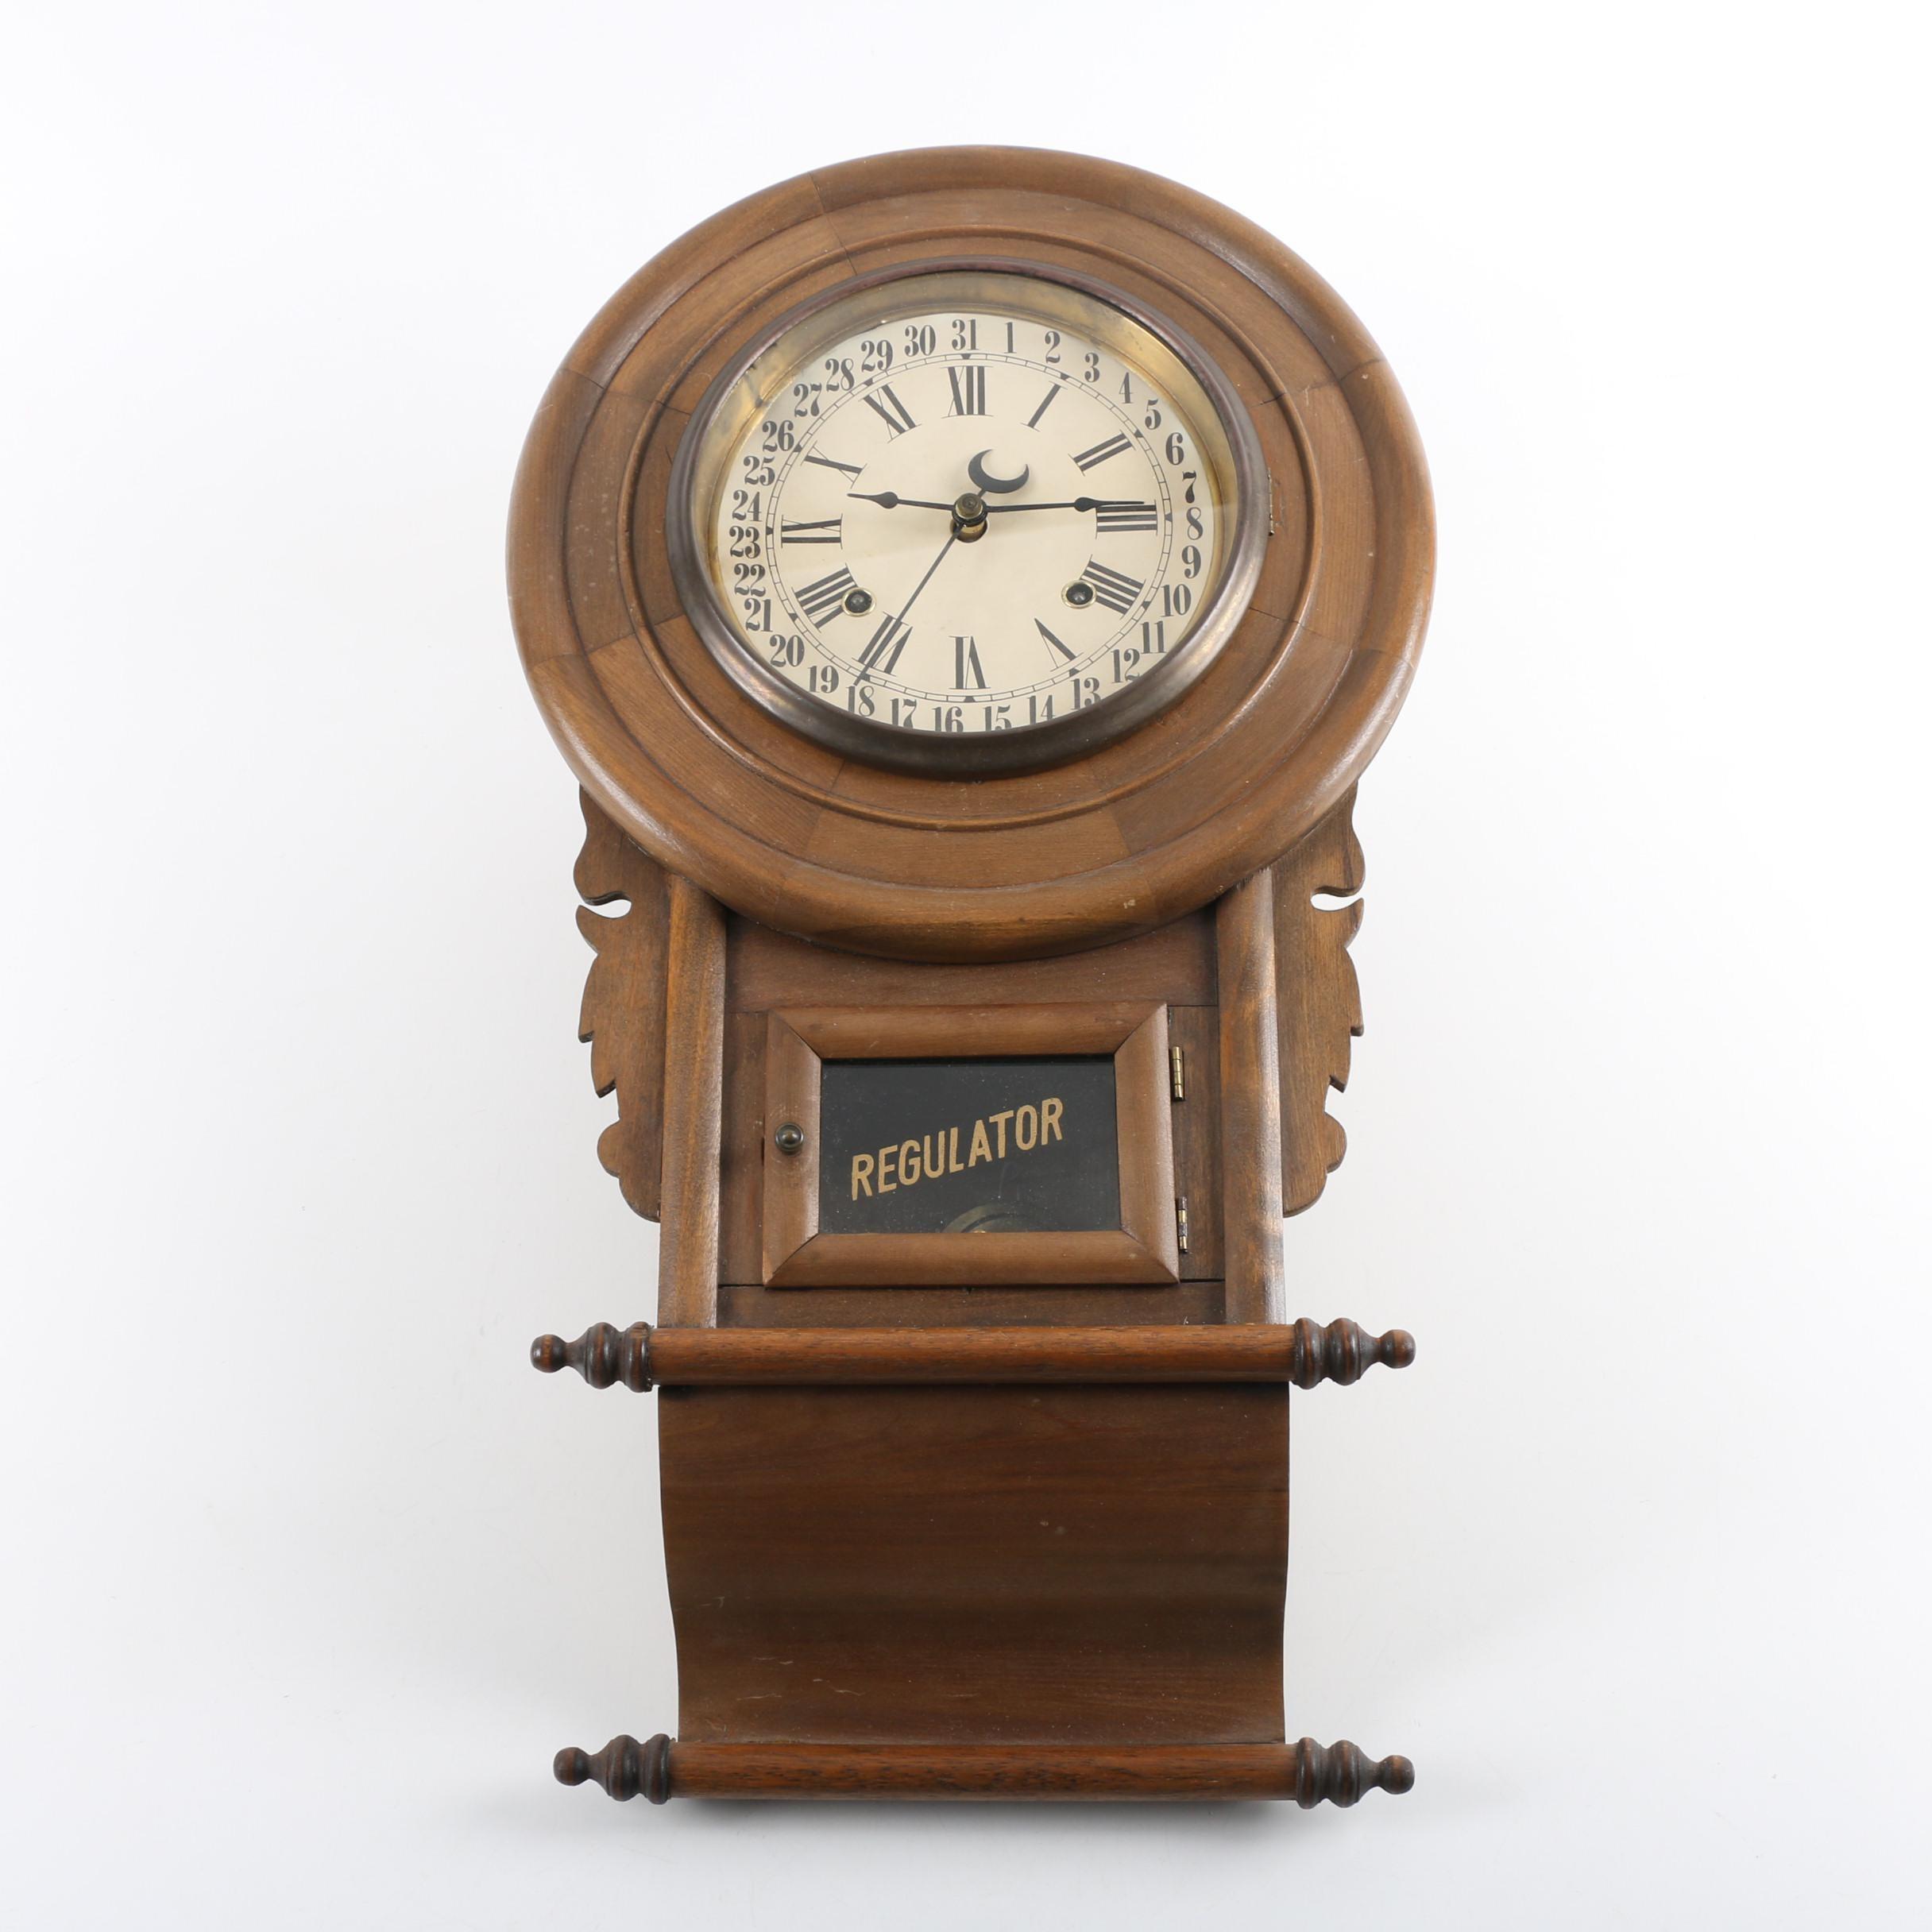 Early 20th Century English Style Regulator Wall Clock